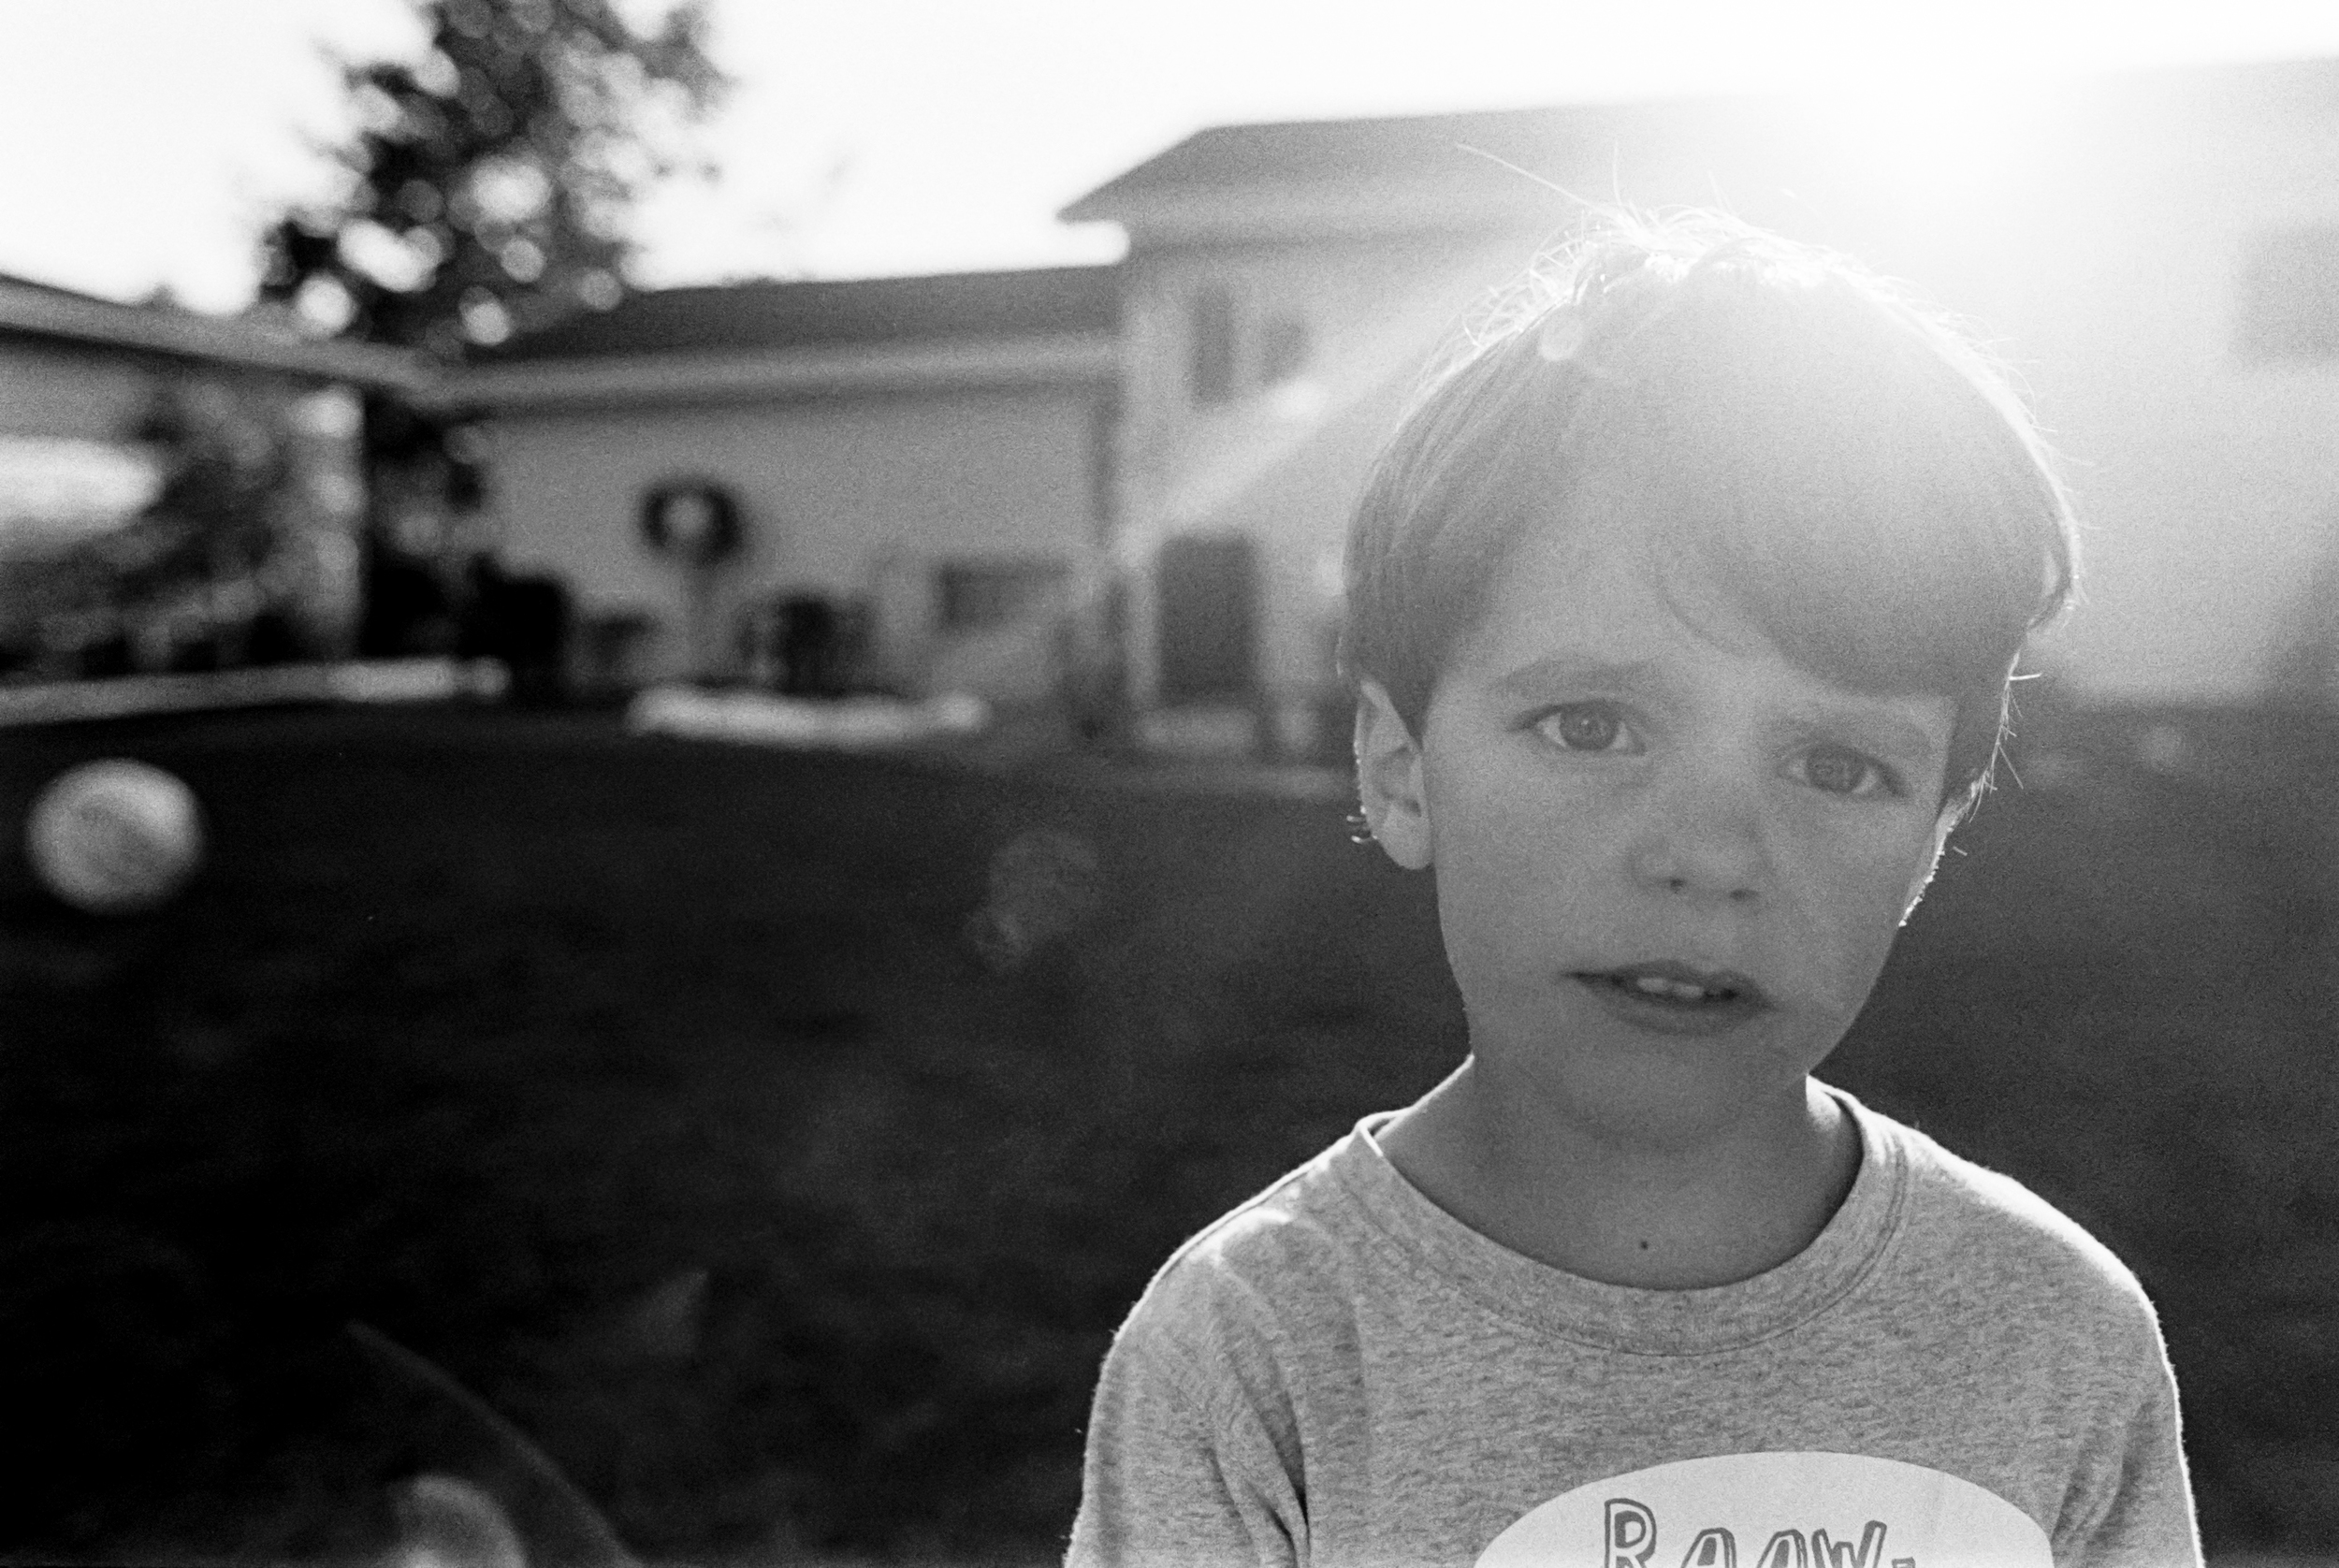 Kodak400TriX_rated200_May2016-11.jpg